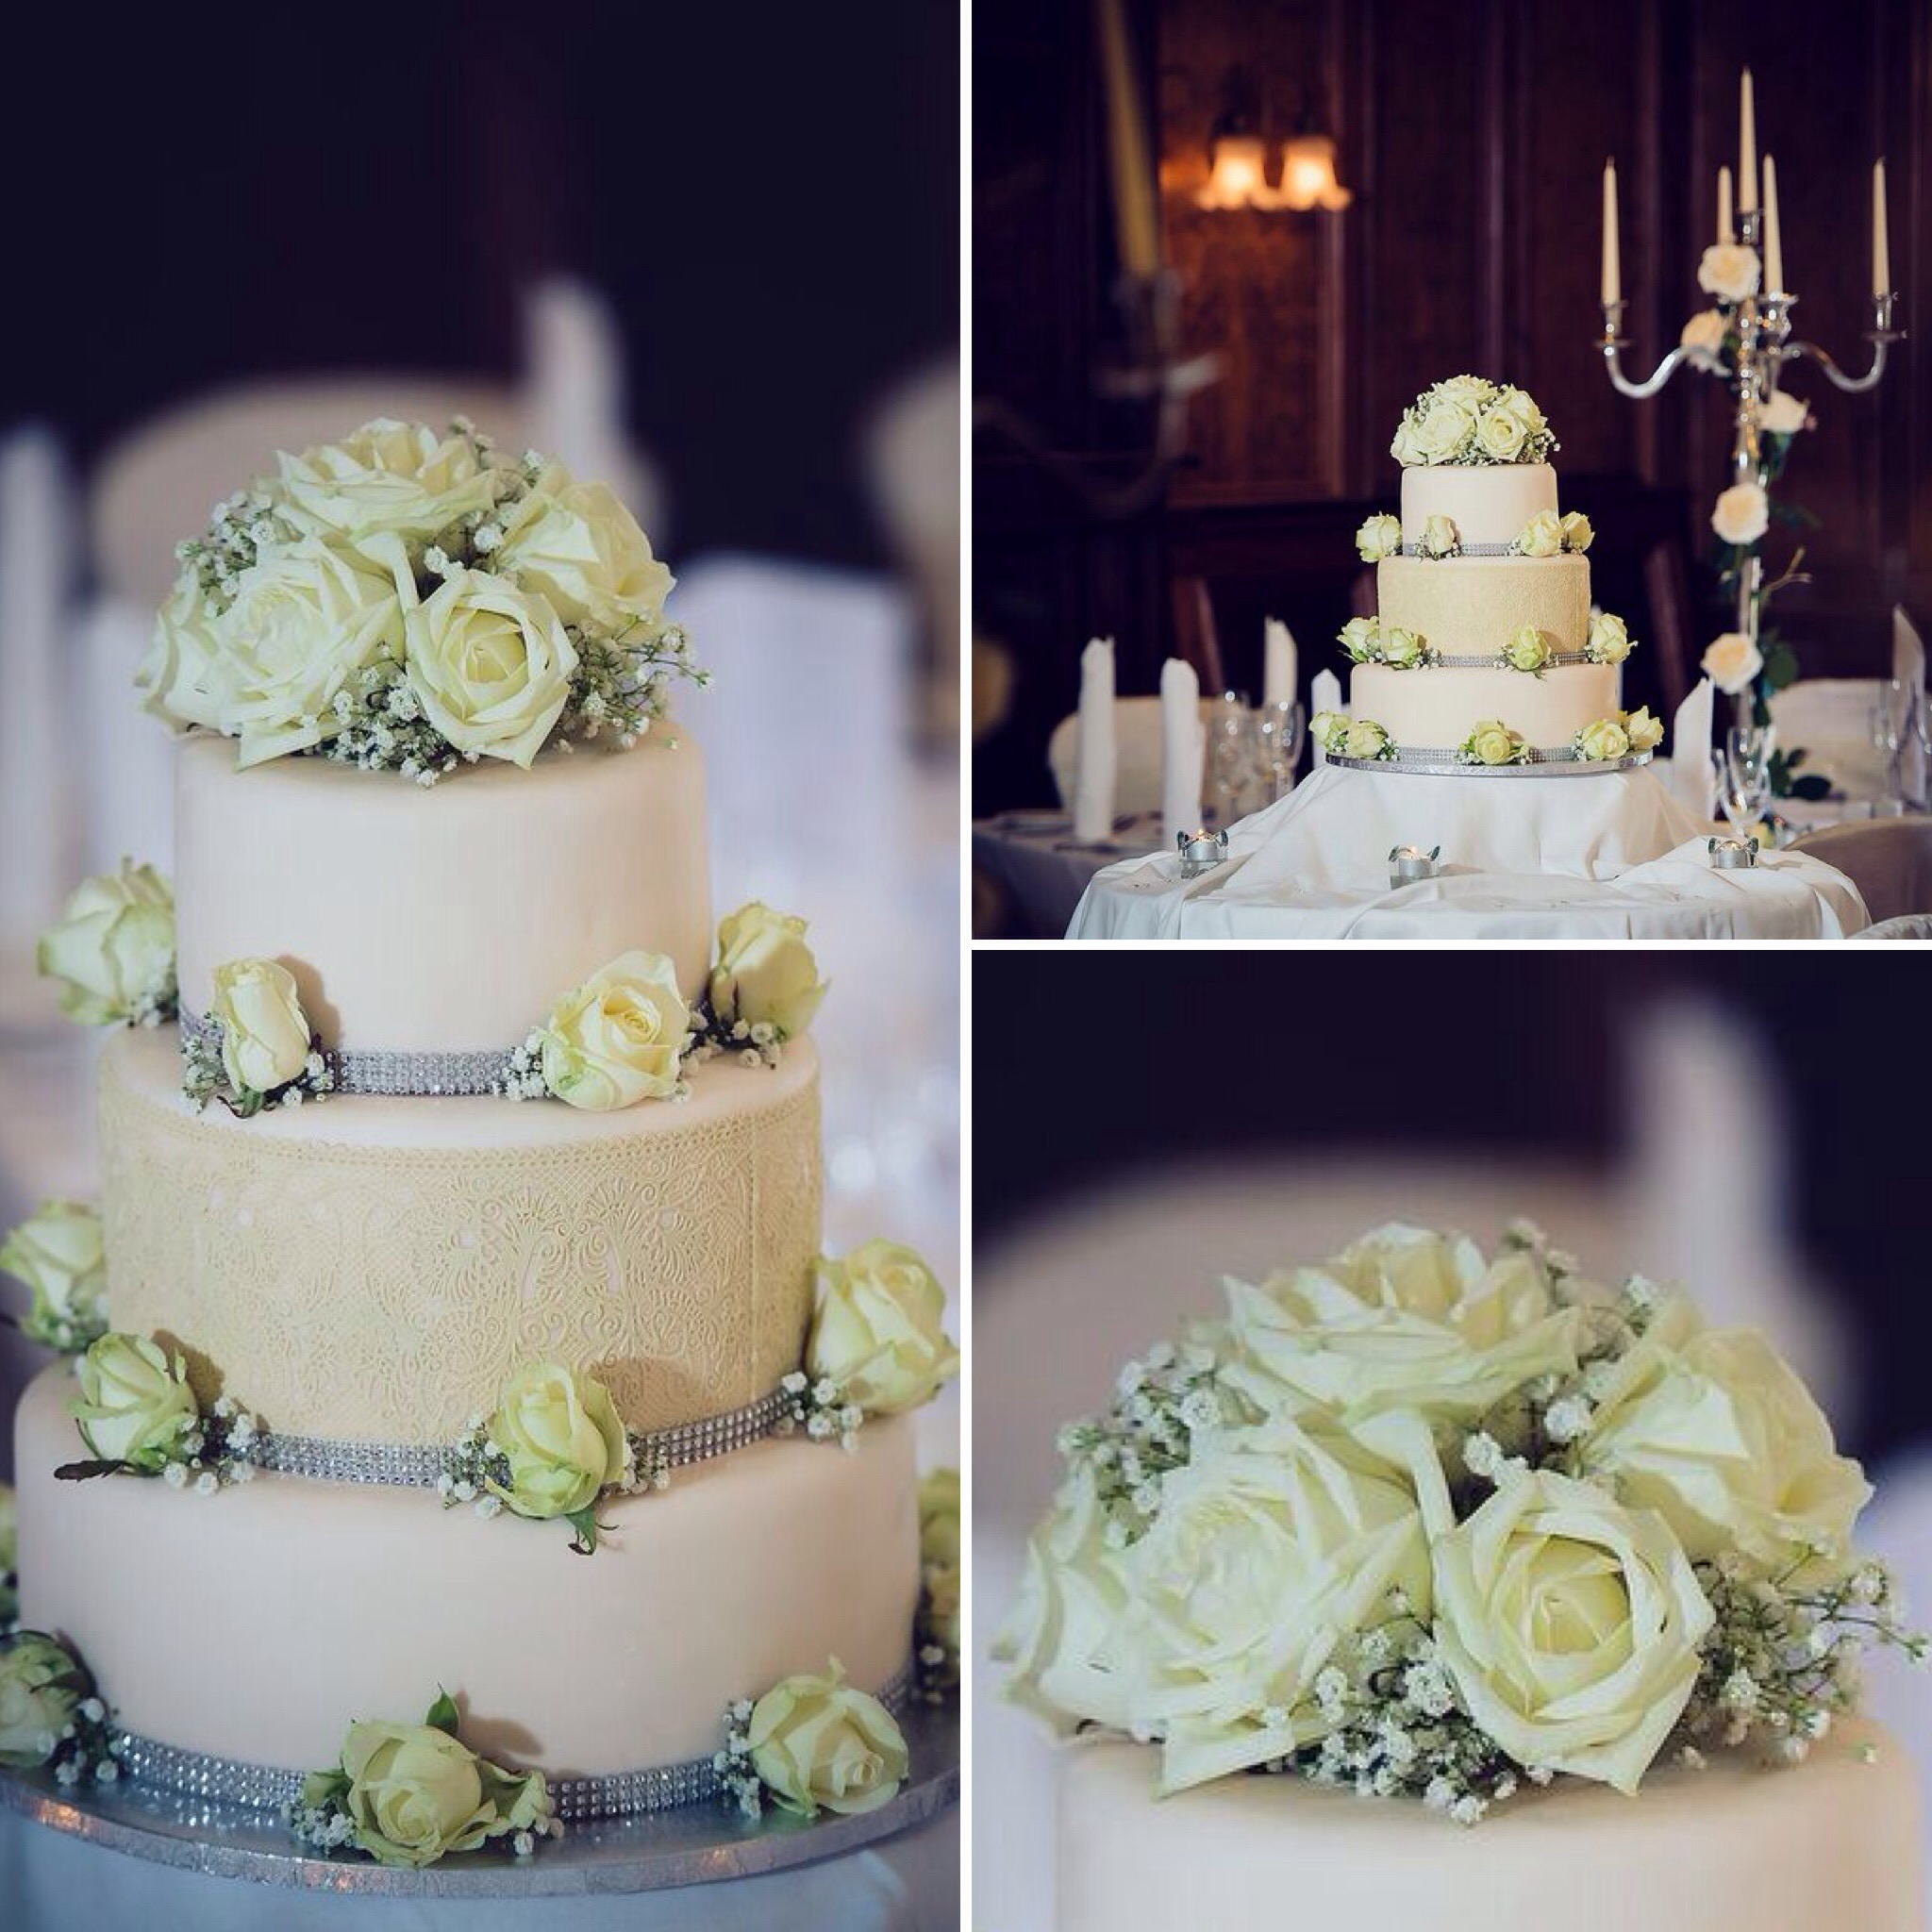 Wedding Cakes Killarney 5000 Simple Wedding Cakes